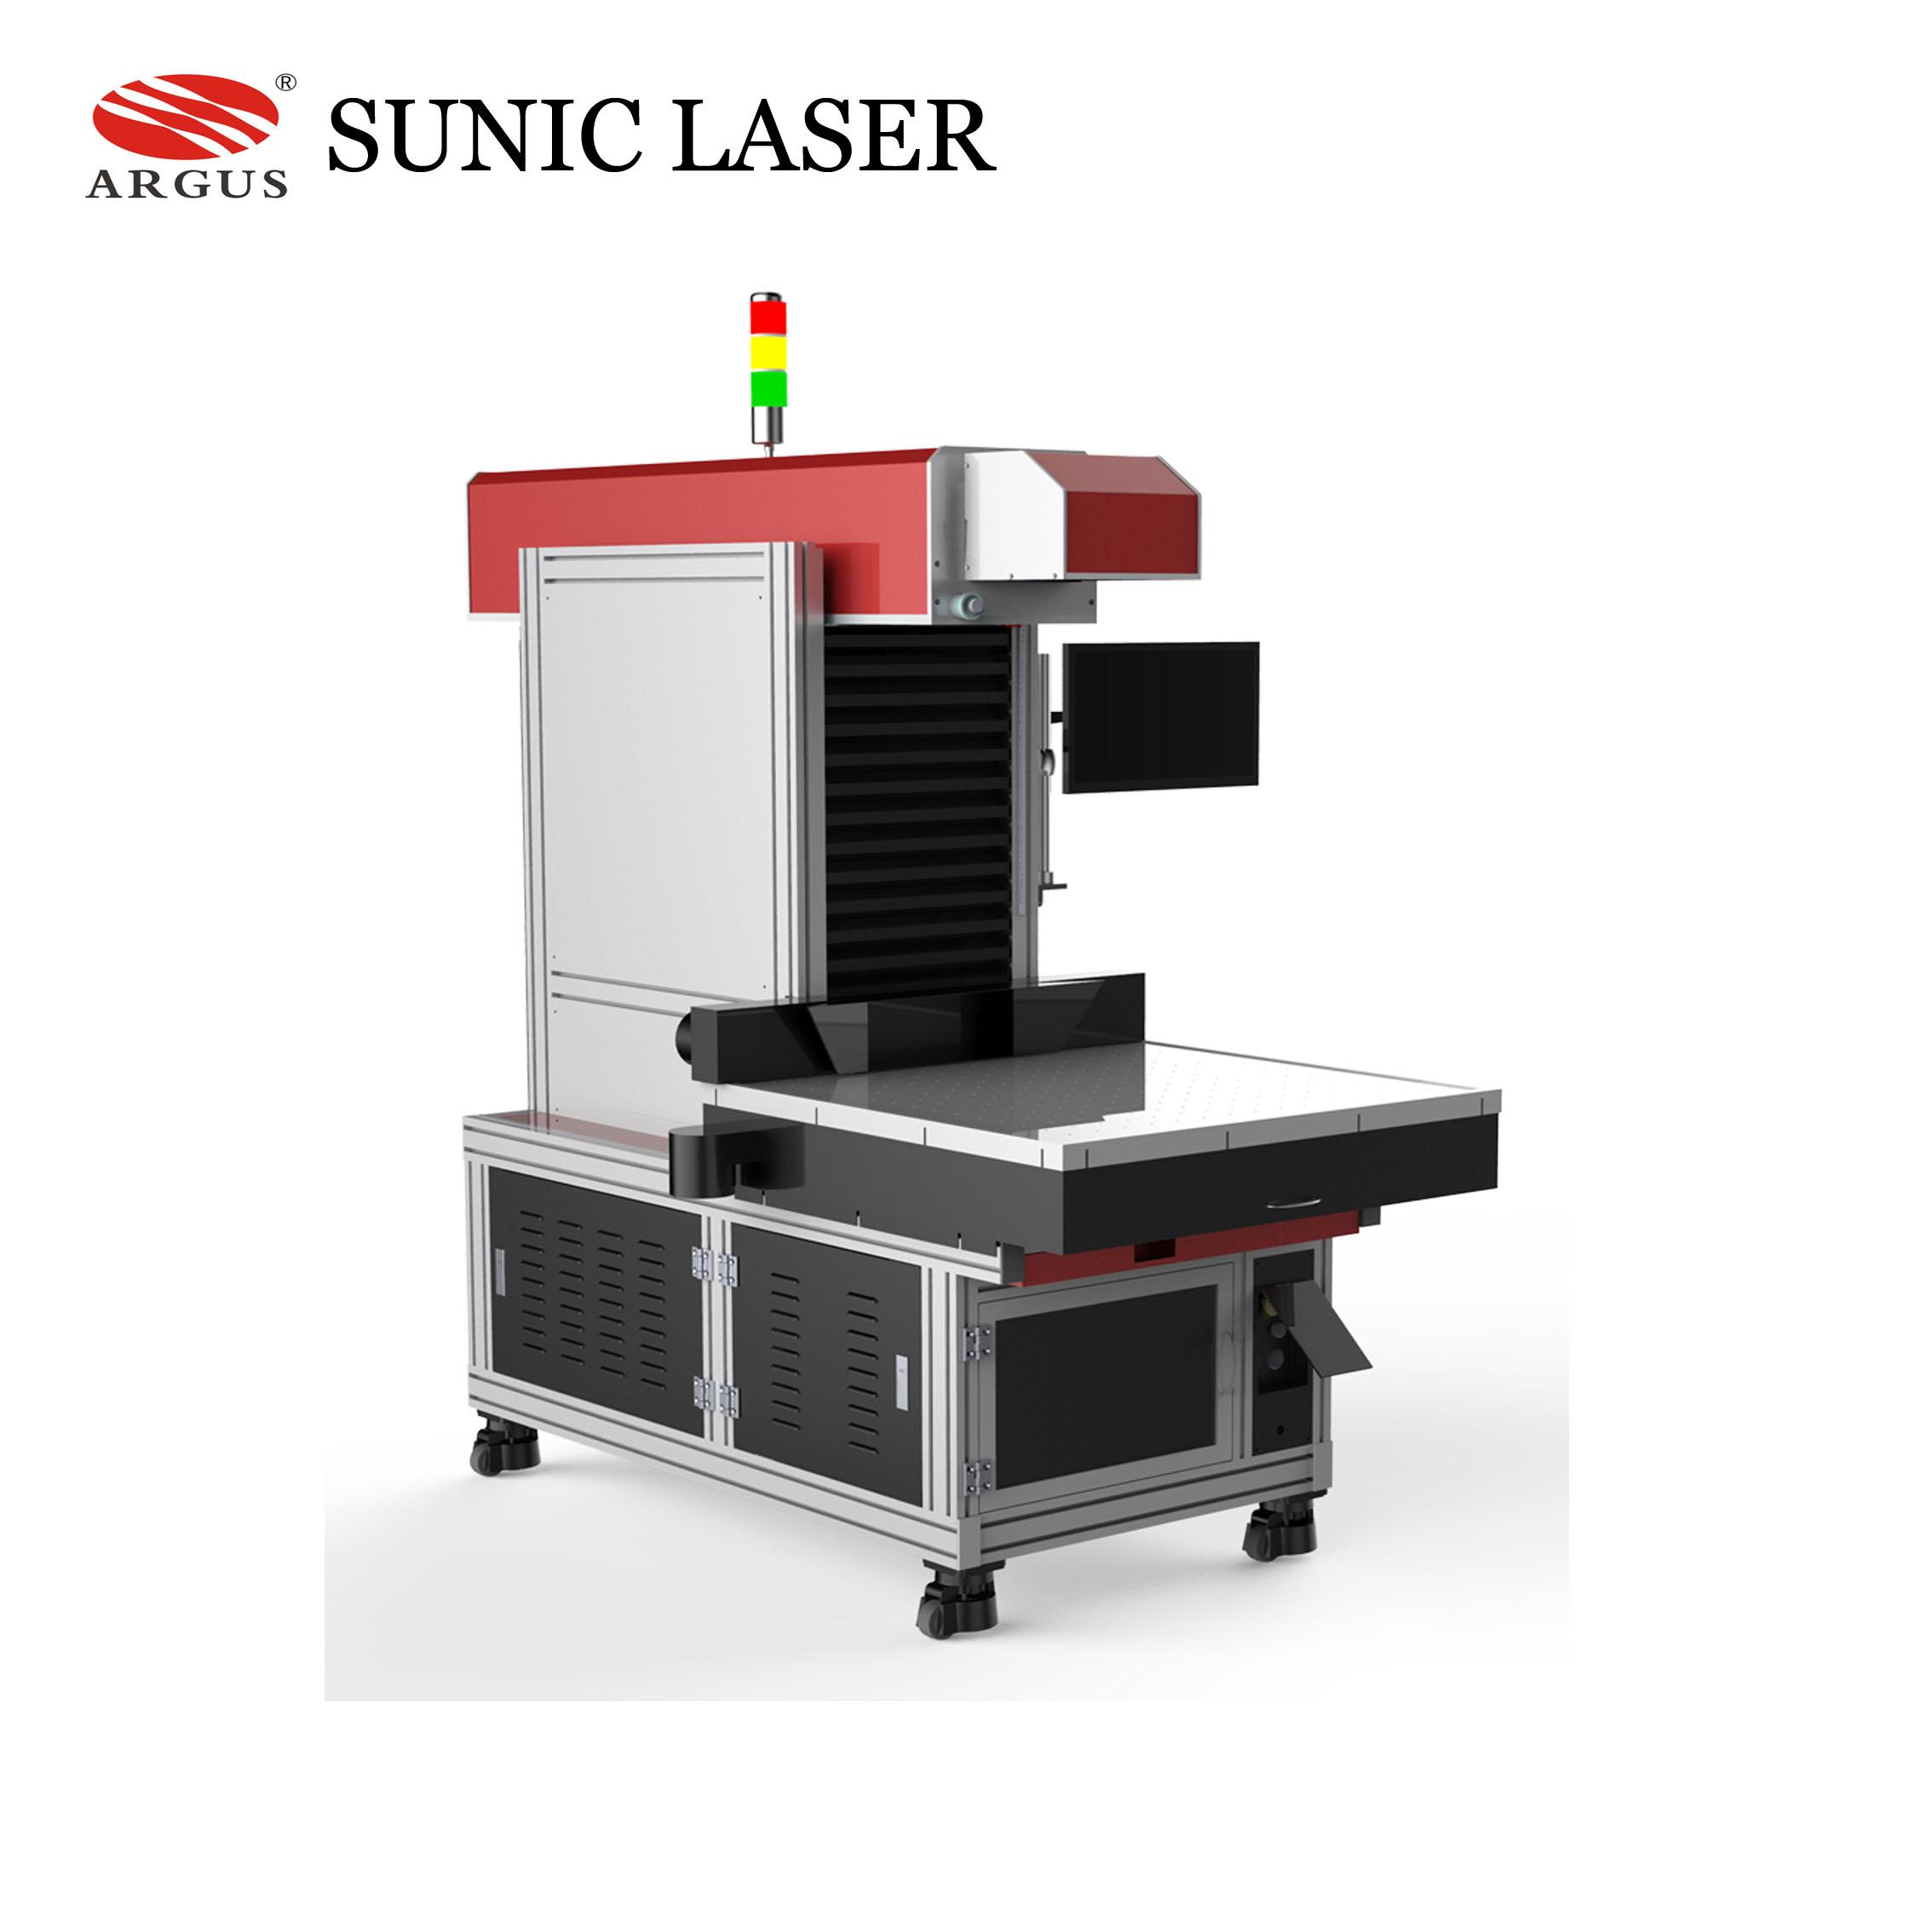 Galvo Laser Leather CO2 Laser Marking Machine